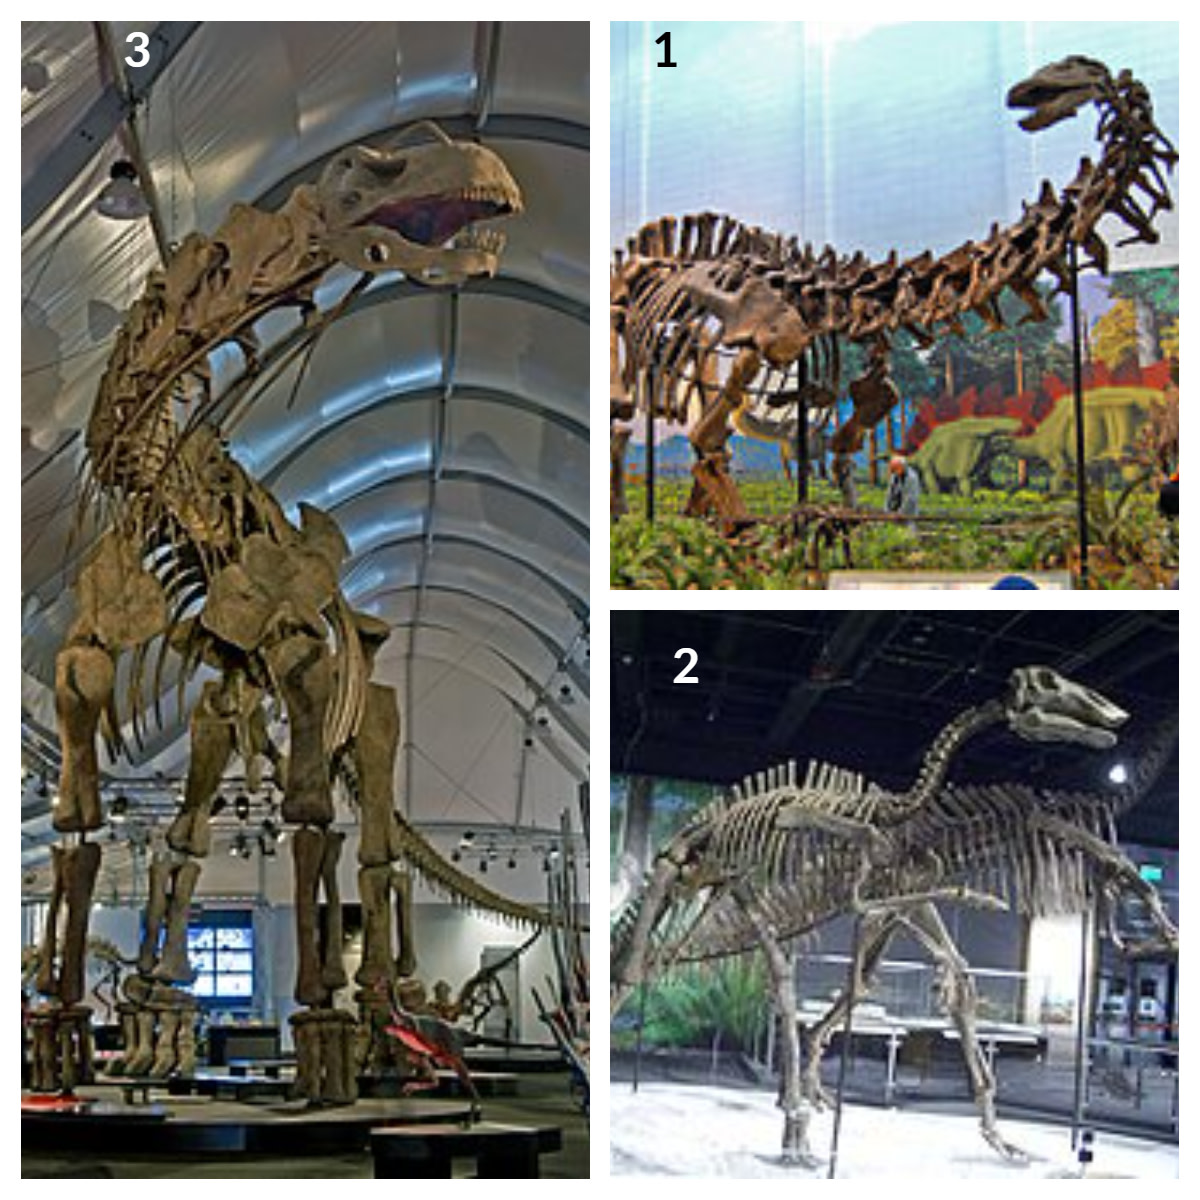 1. Aptosaurus Dinosaur  2. Argentinasaurus Dinosaur 3. Bactrosaurus Dinosaur